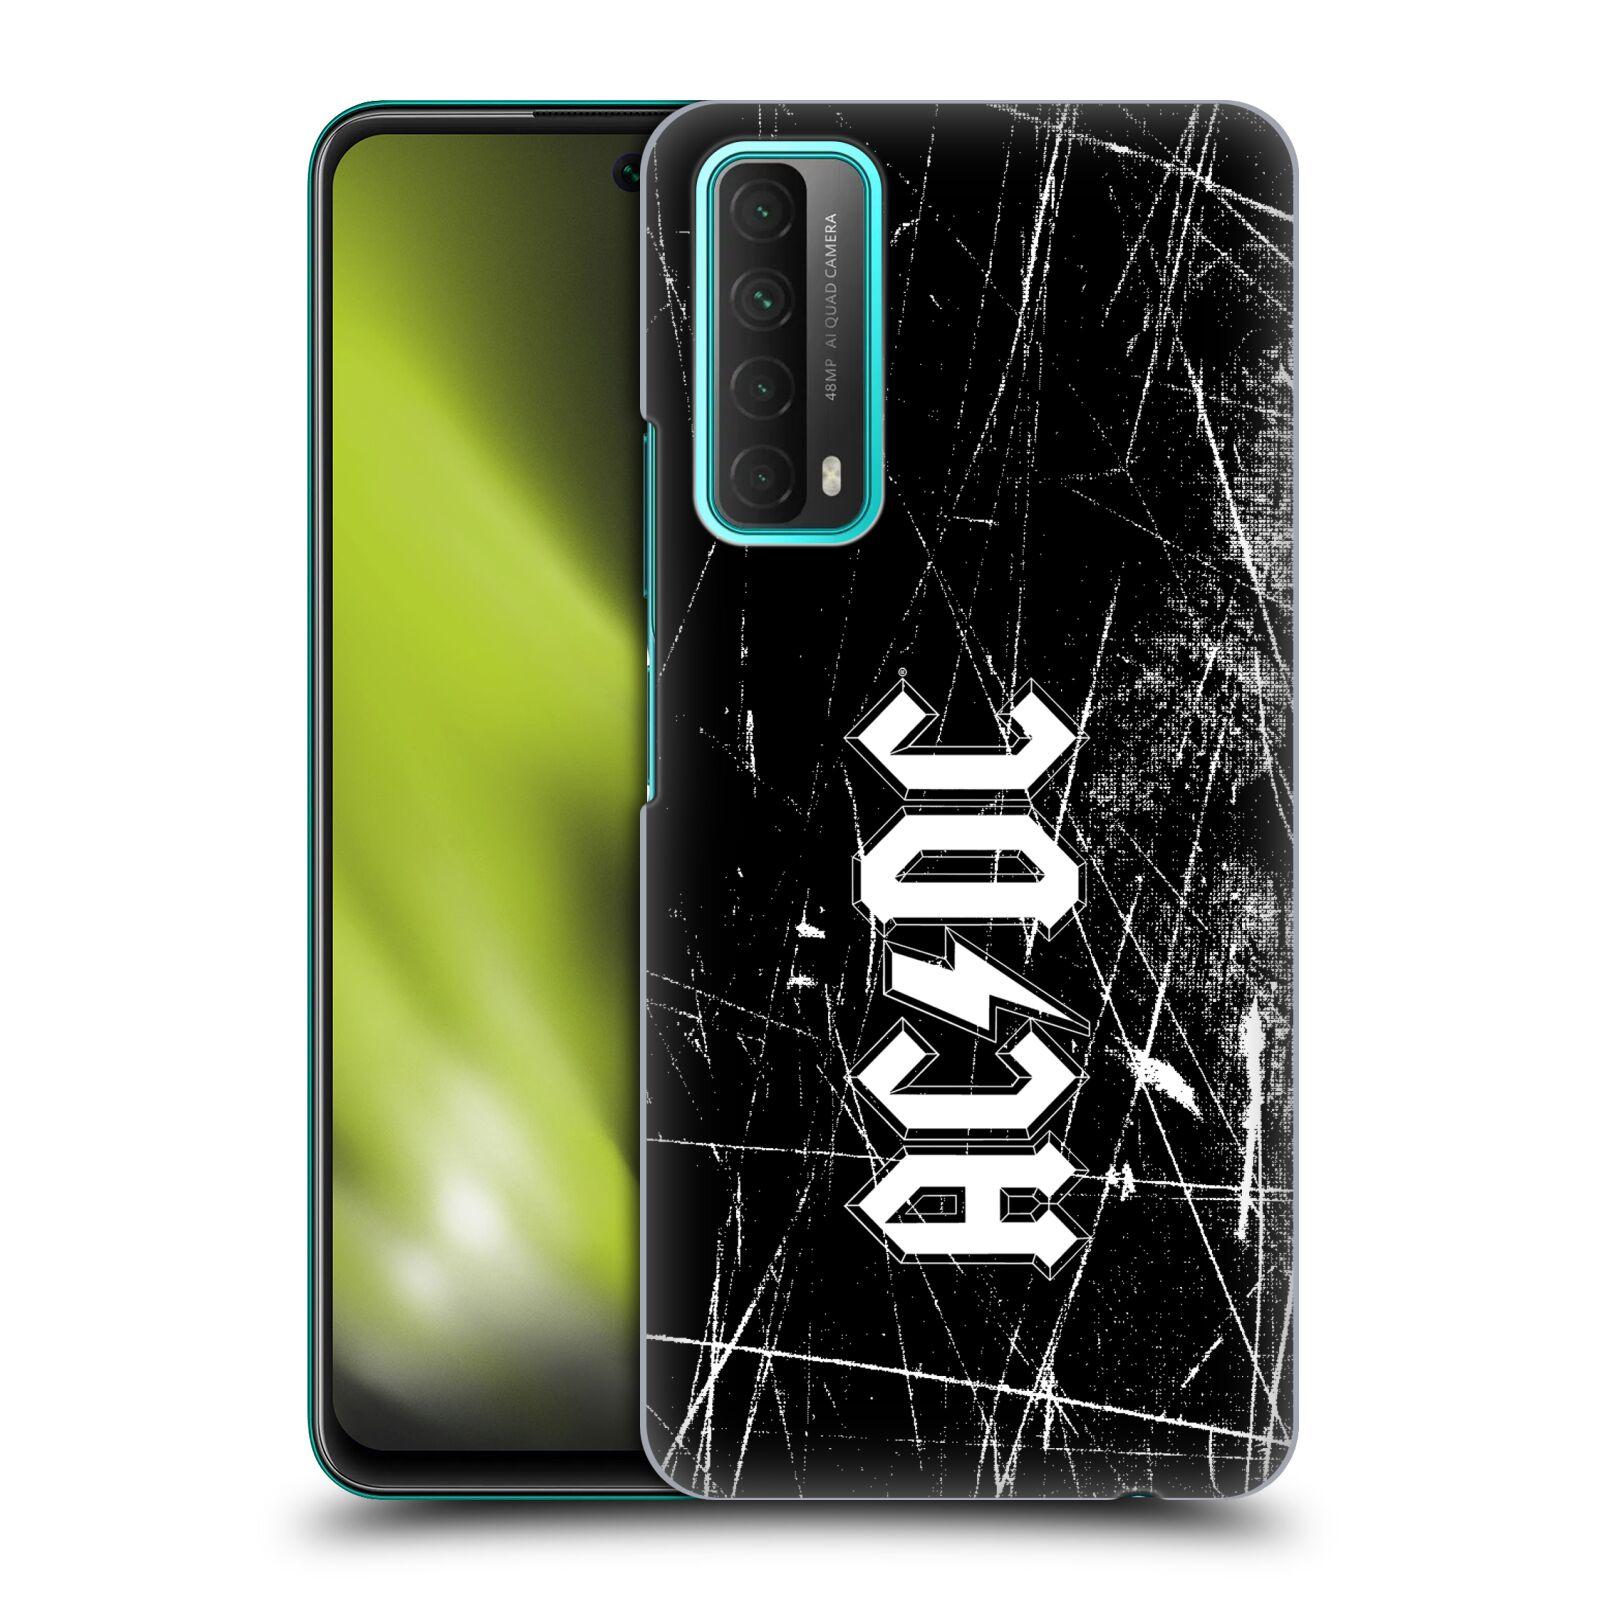 Plastové pouzdro na mobil Huawei P Smart (2021) - Head Case - AC/DC Černobílé logo